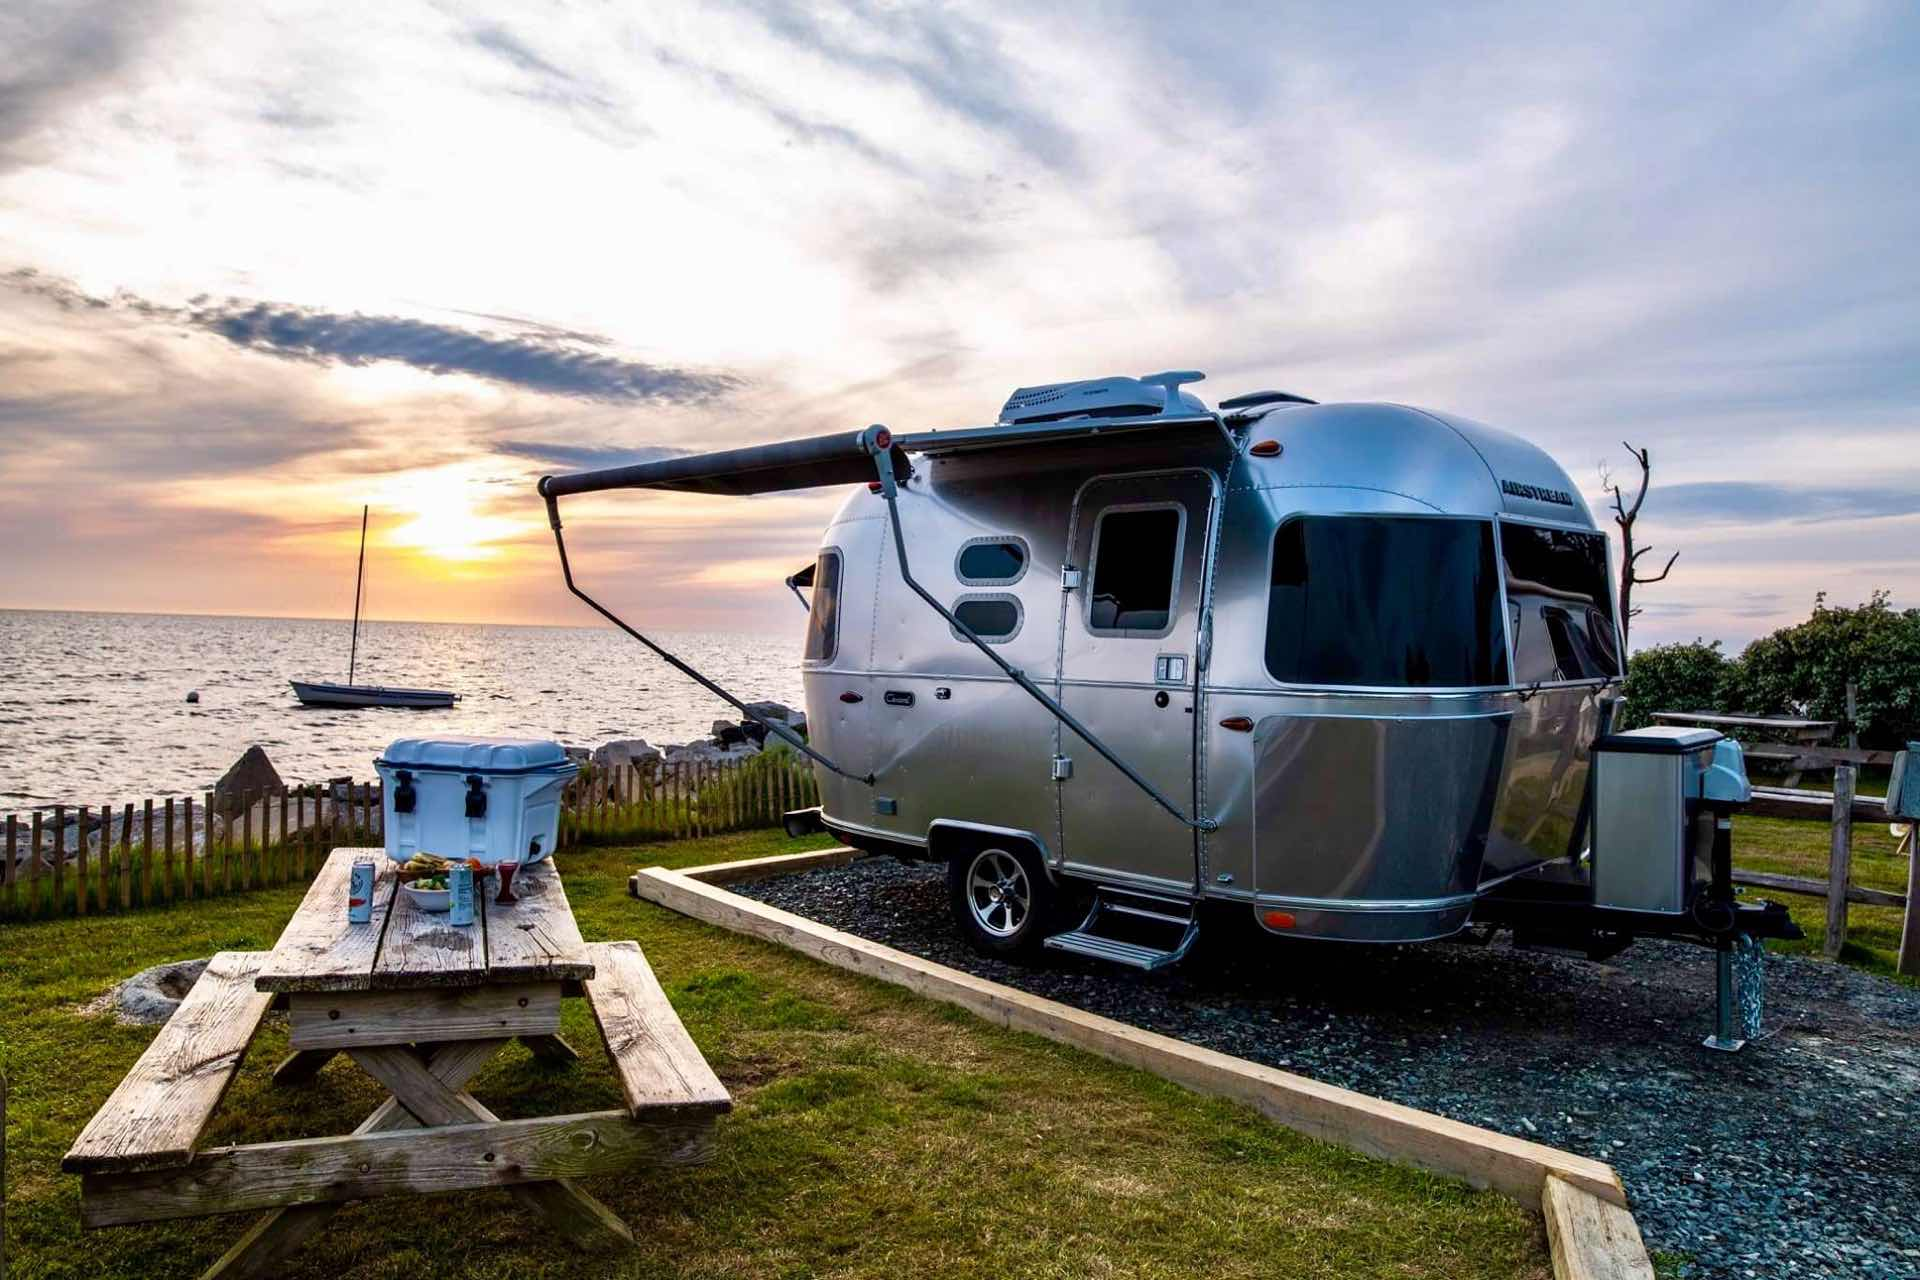 airstream-caravel-bambi-trailers-2020